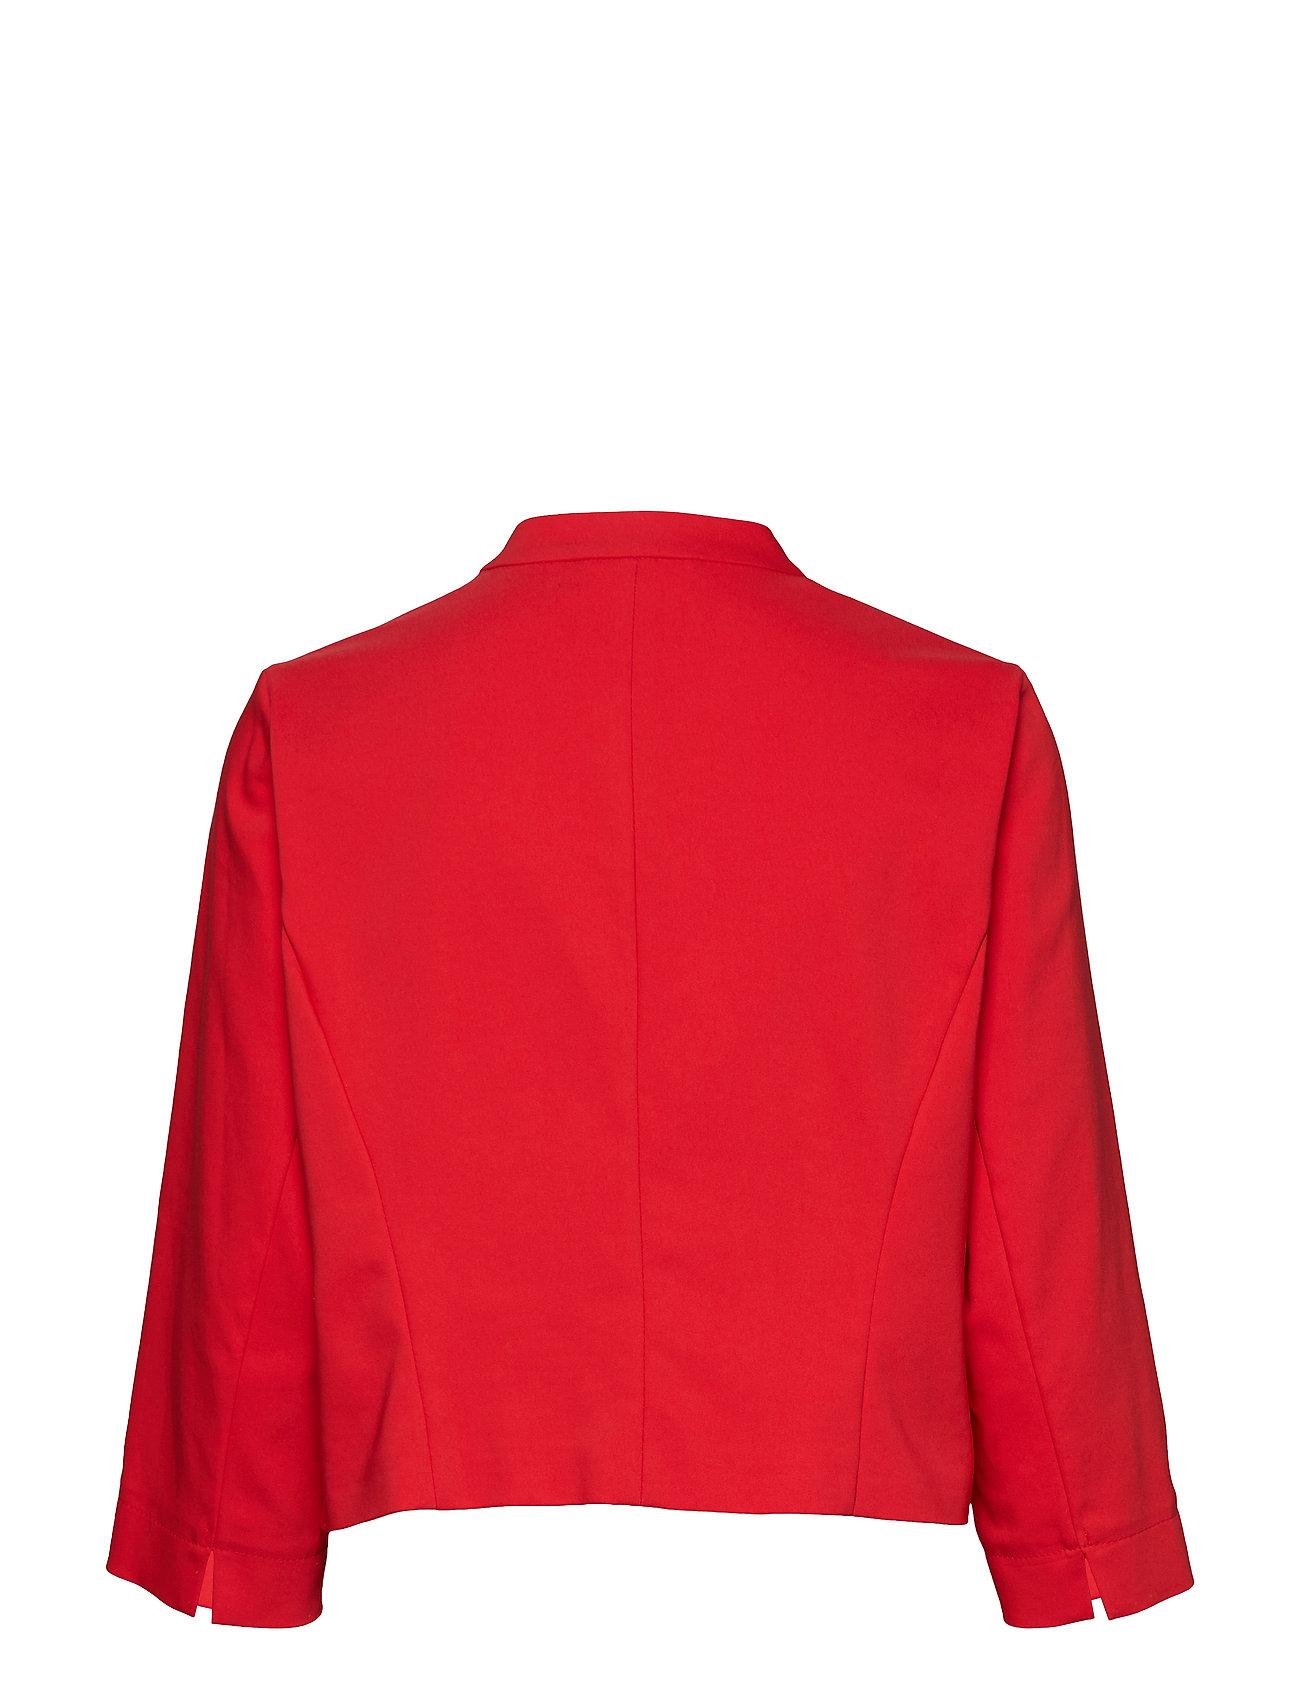 GERRY Cardigan 35Sale Blazer Blazer Rot WEBER Jackett v6m7fyIYbg